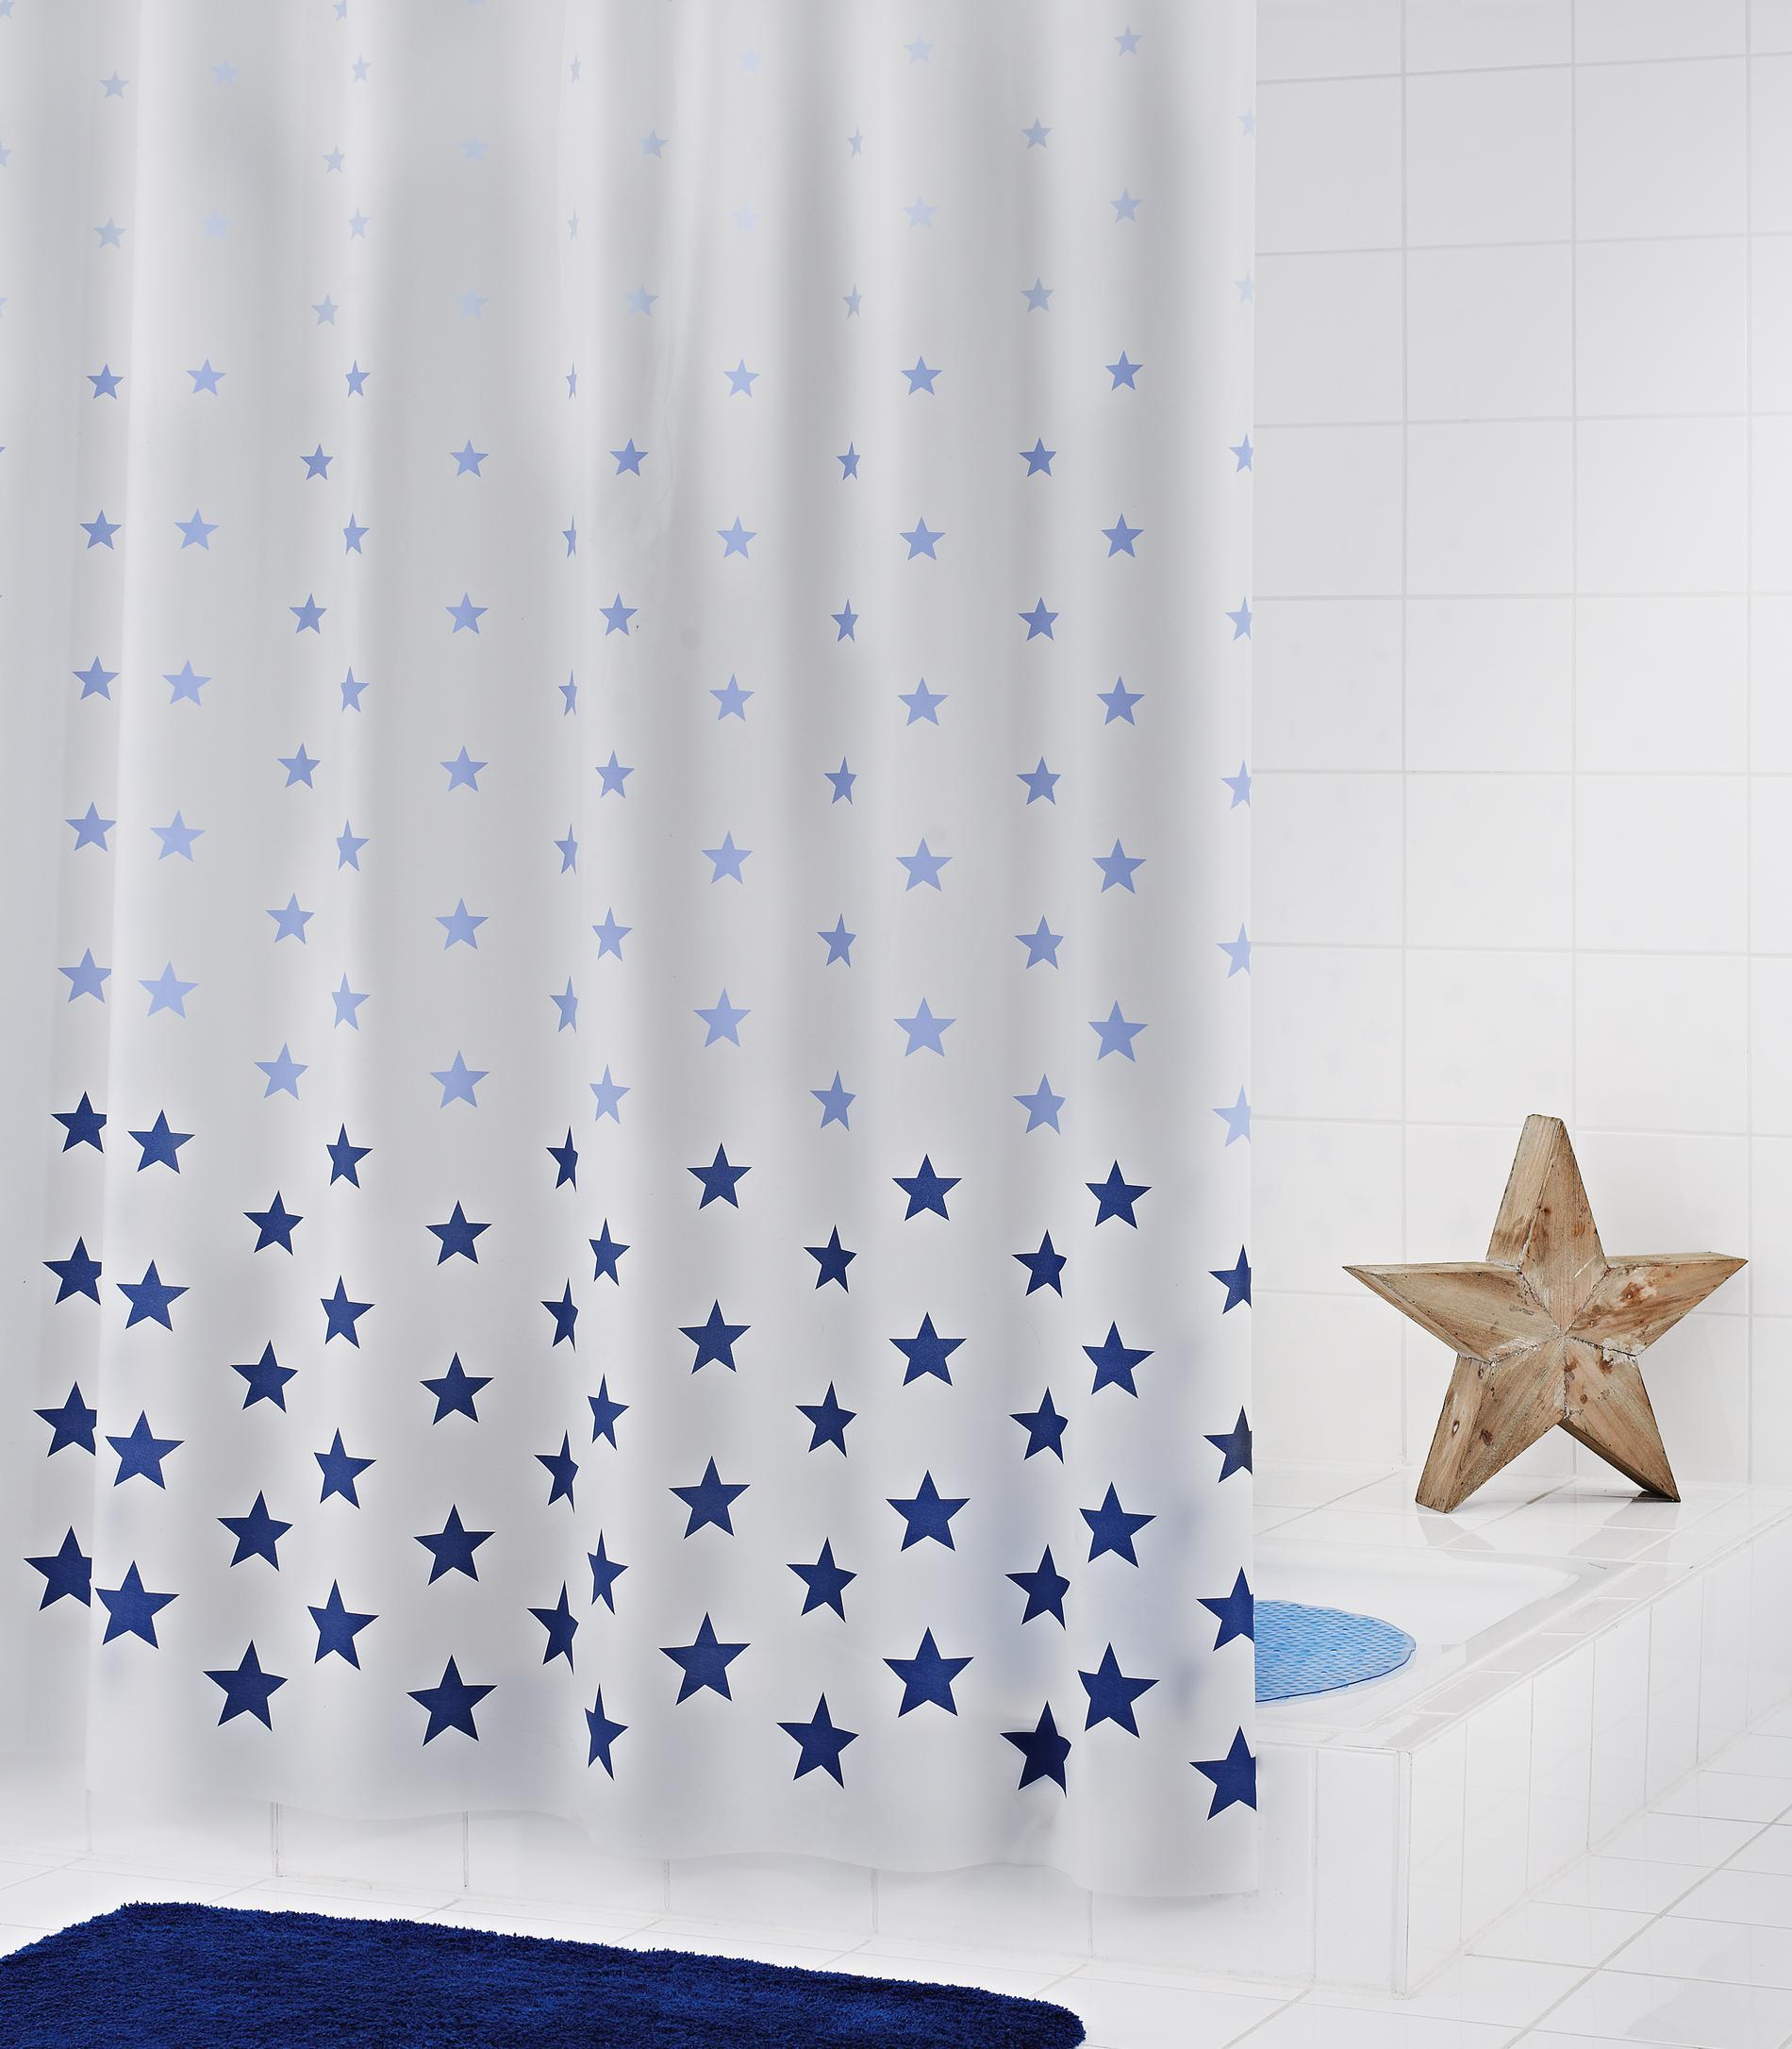 RIDDER Duschvorhang Folie Stella 180x200 cm blau Folienvorhang Plastikvorhang